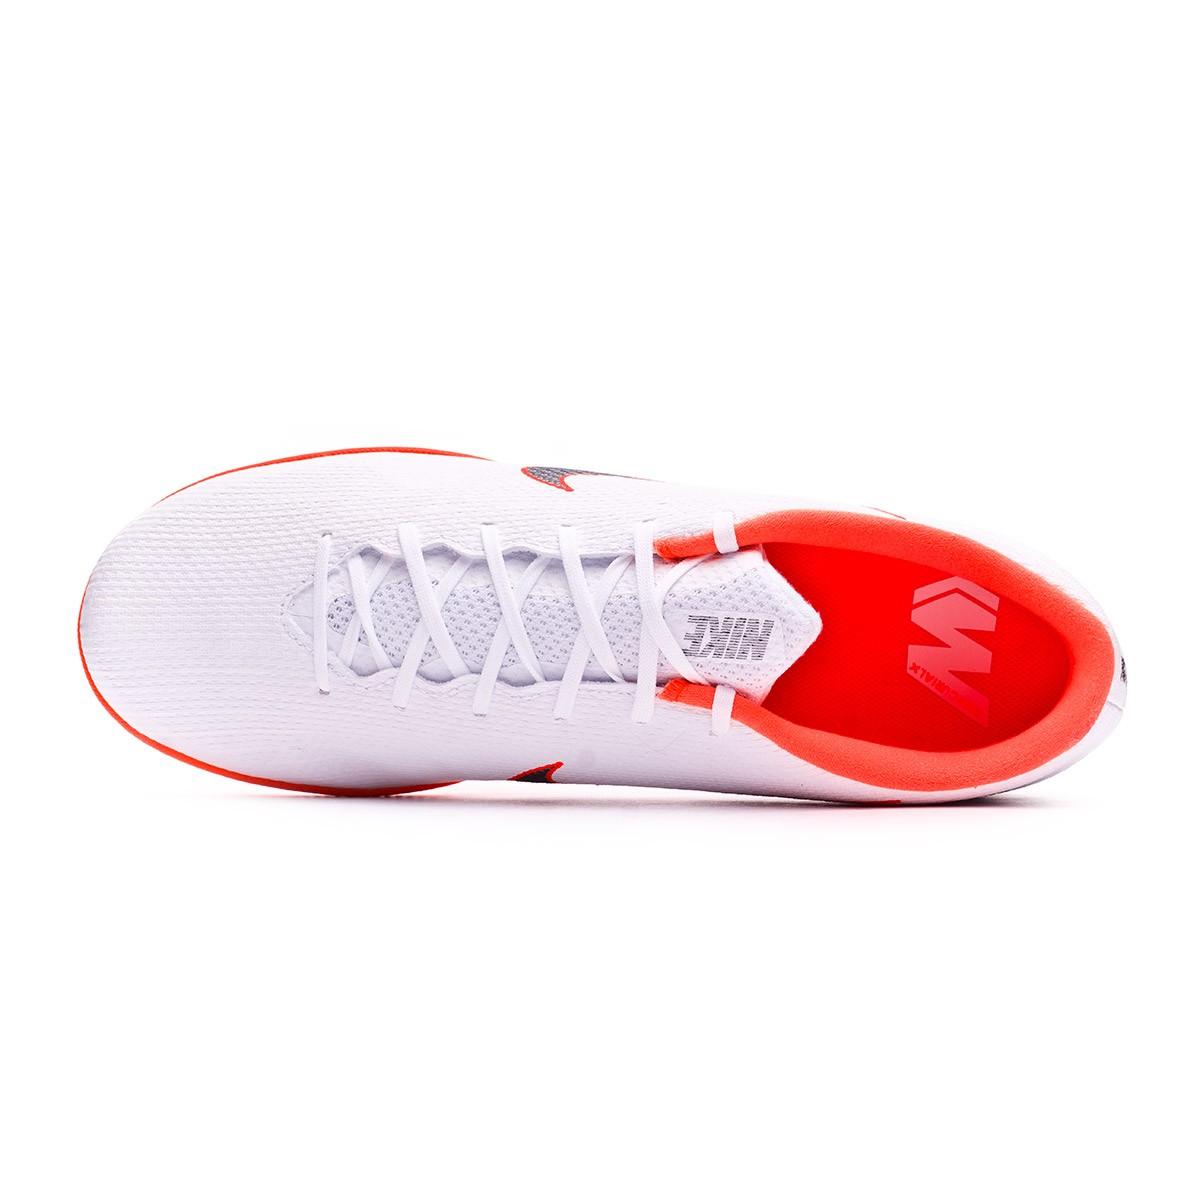 4fa216f9297 Futsal Boot Nike Mercurial VaporX XII Academy IC White-Metallic cool grey-Total  orange - Football store Fútbol Emotion